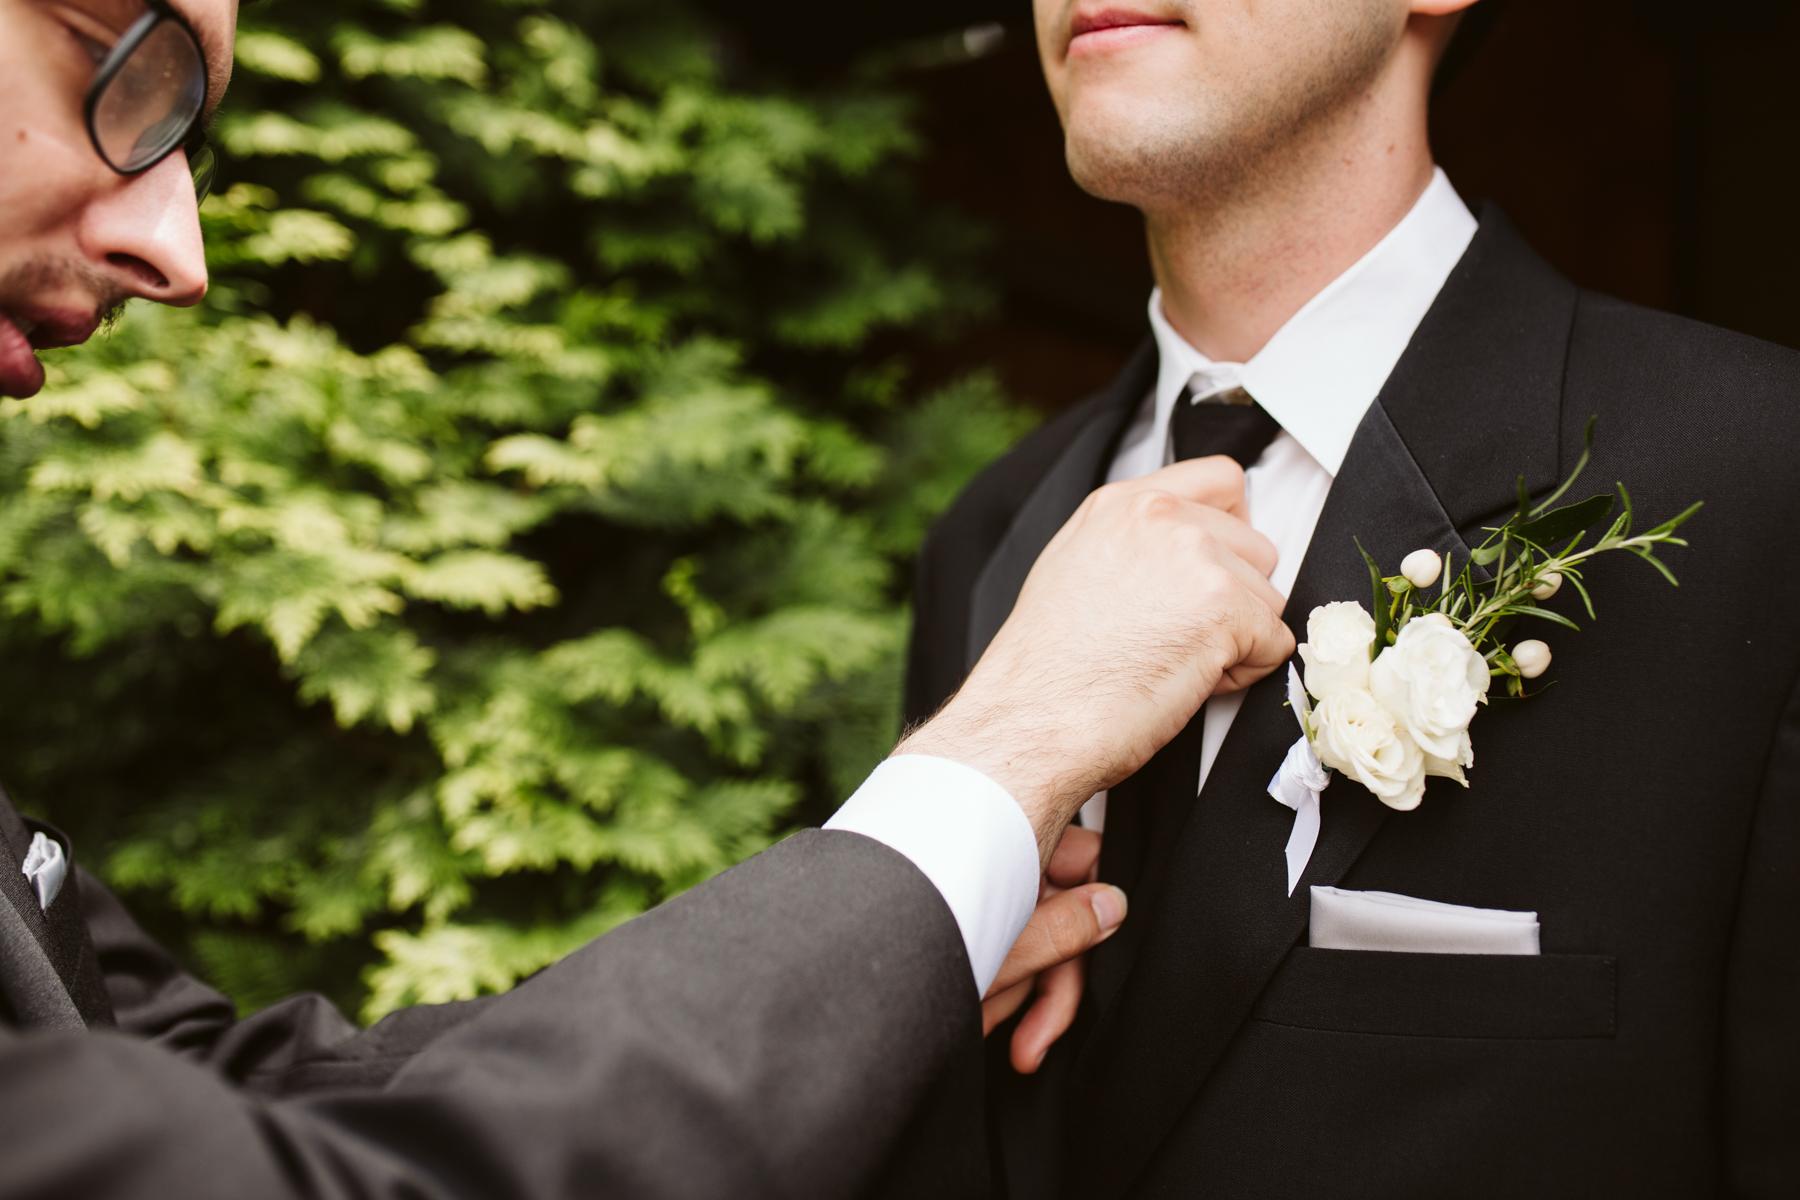 brentwood-hills-wedding (3).jpg